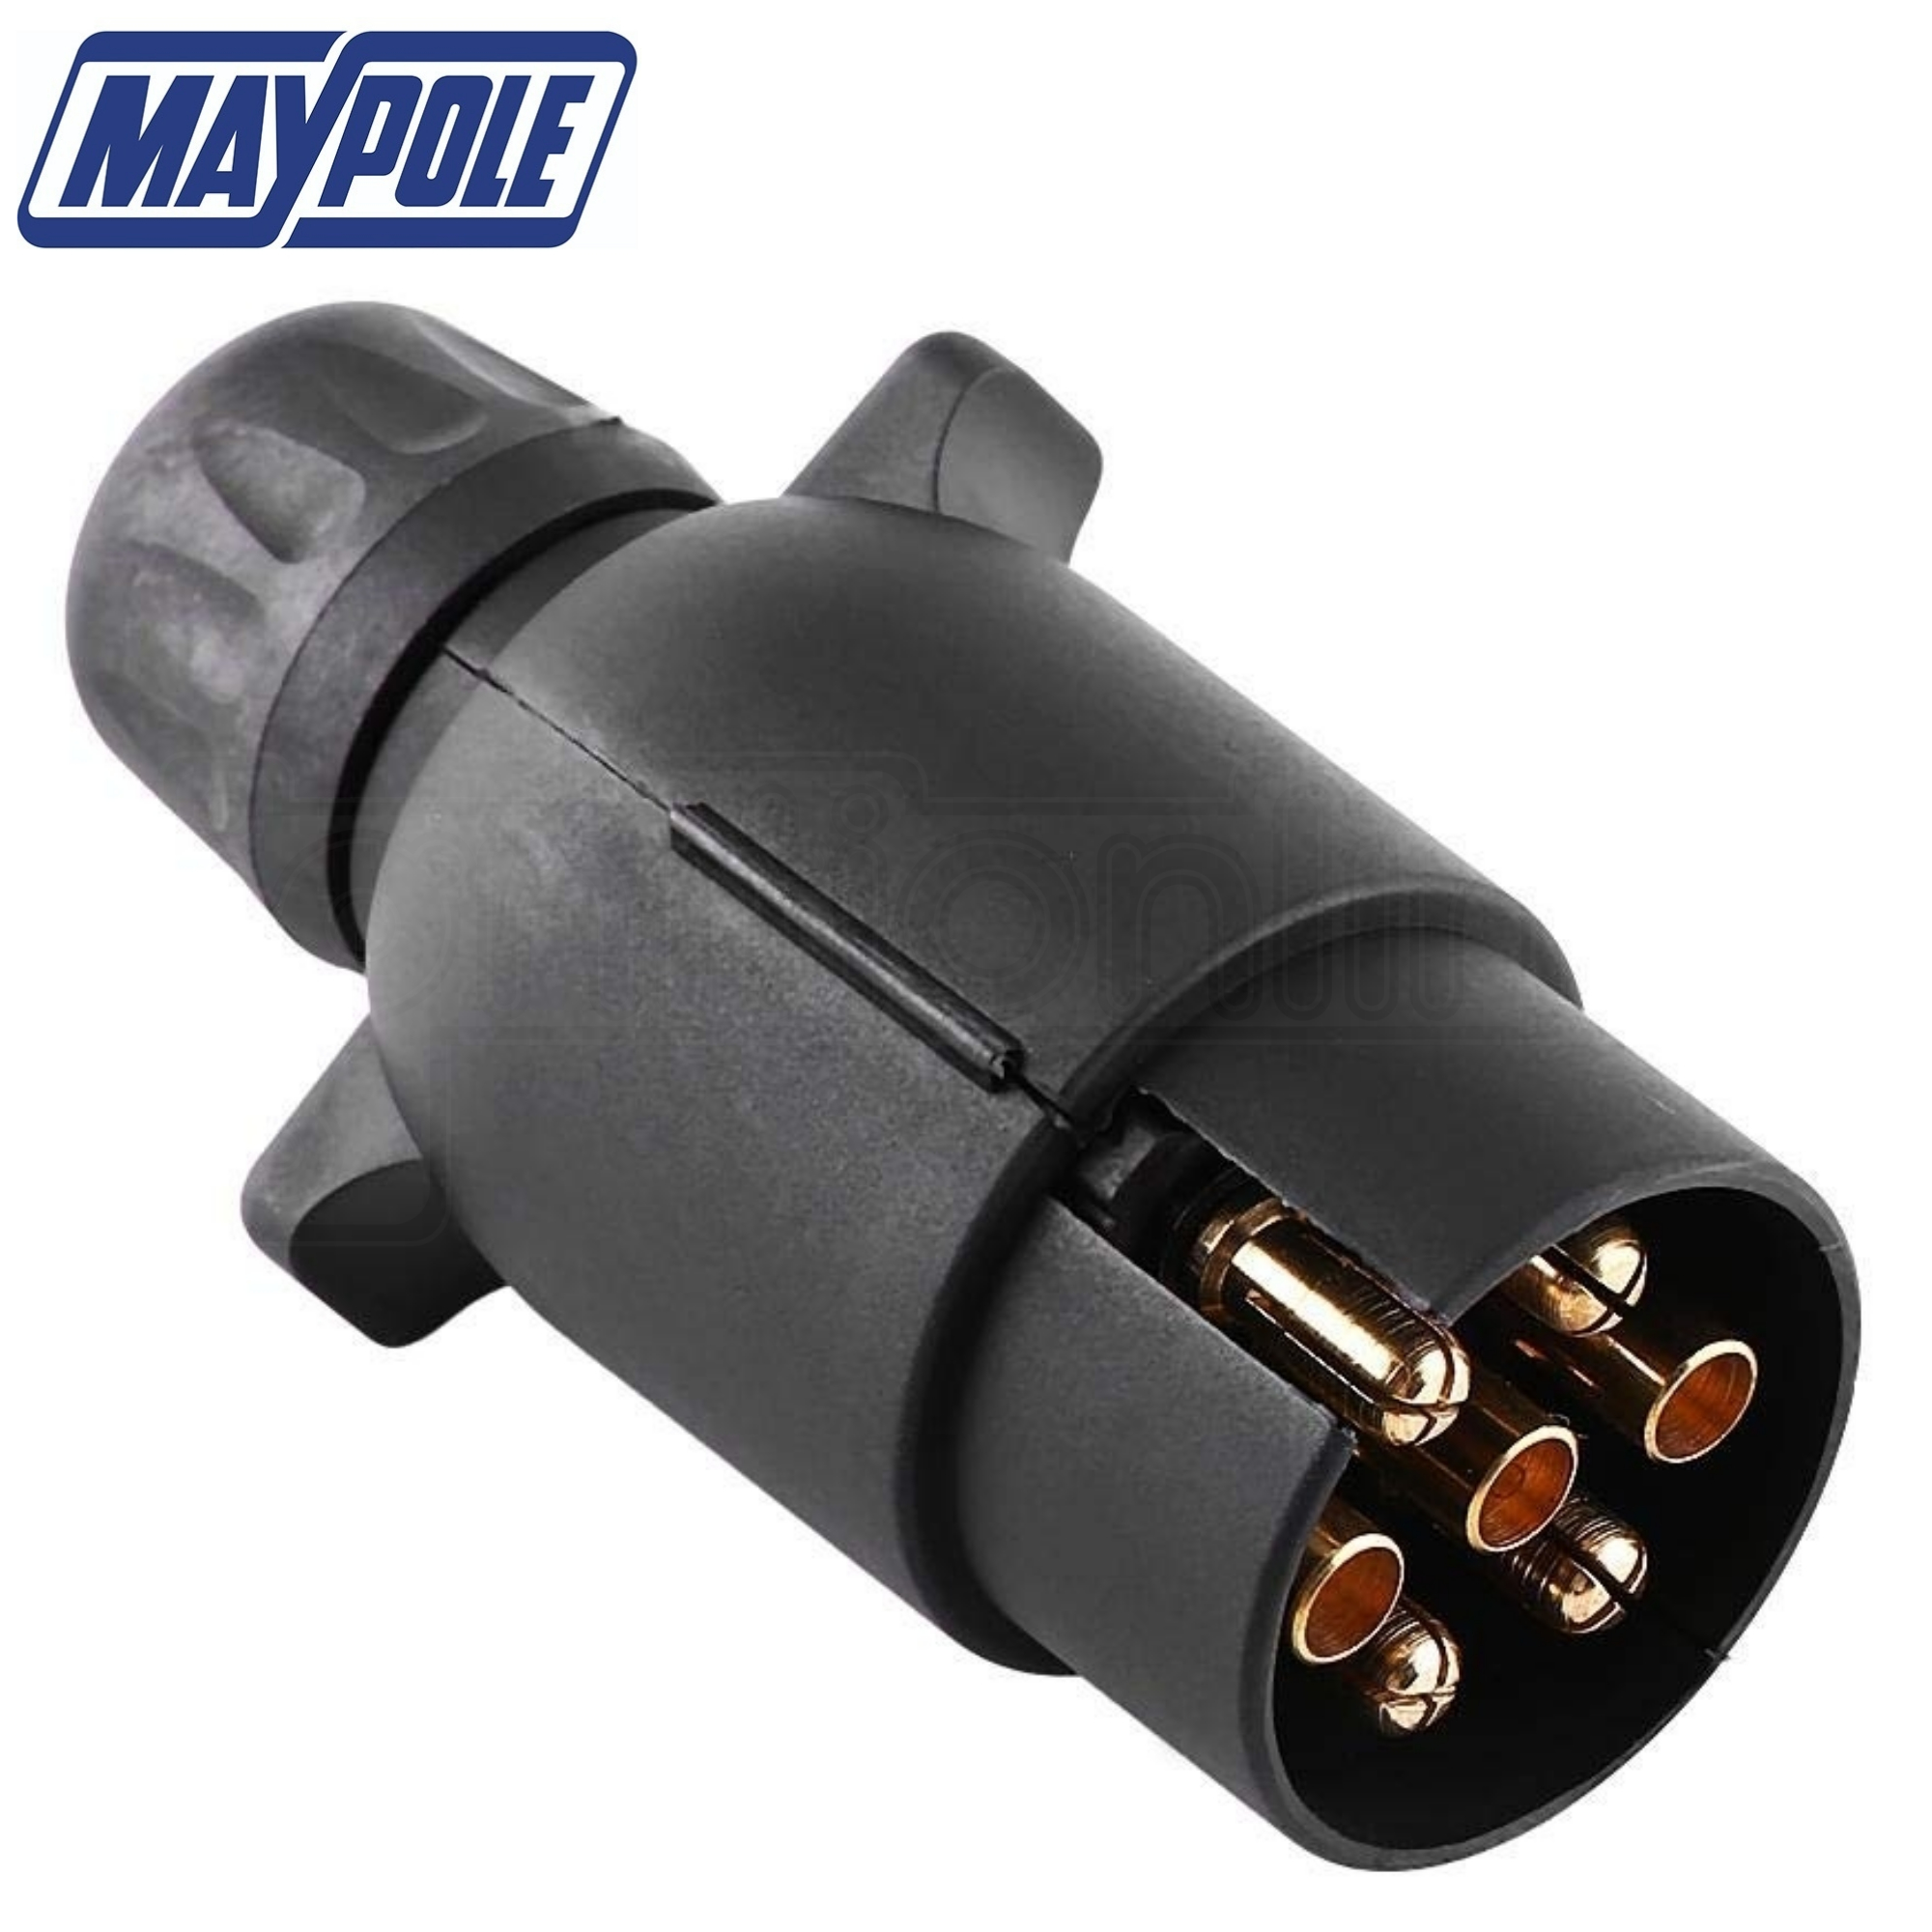 Maypole 12n 7 Pin Plastic Trailer Caravan Plug For Wiring